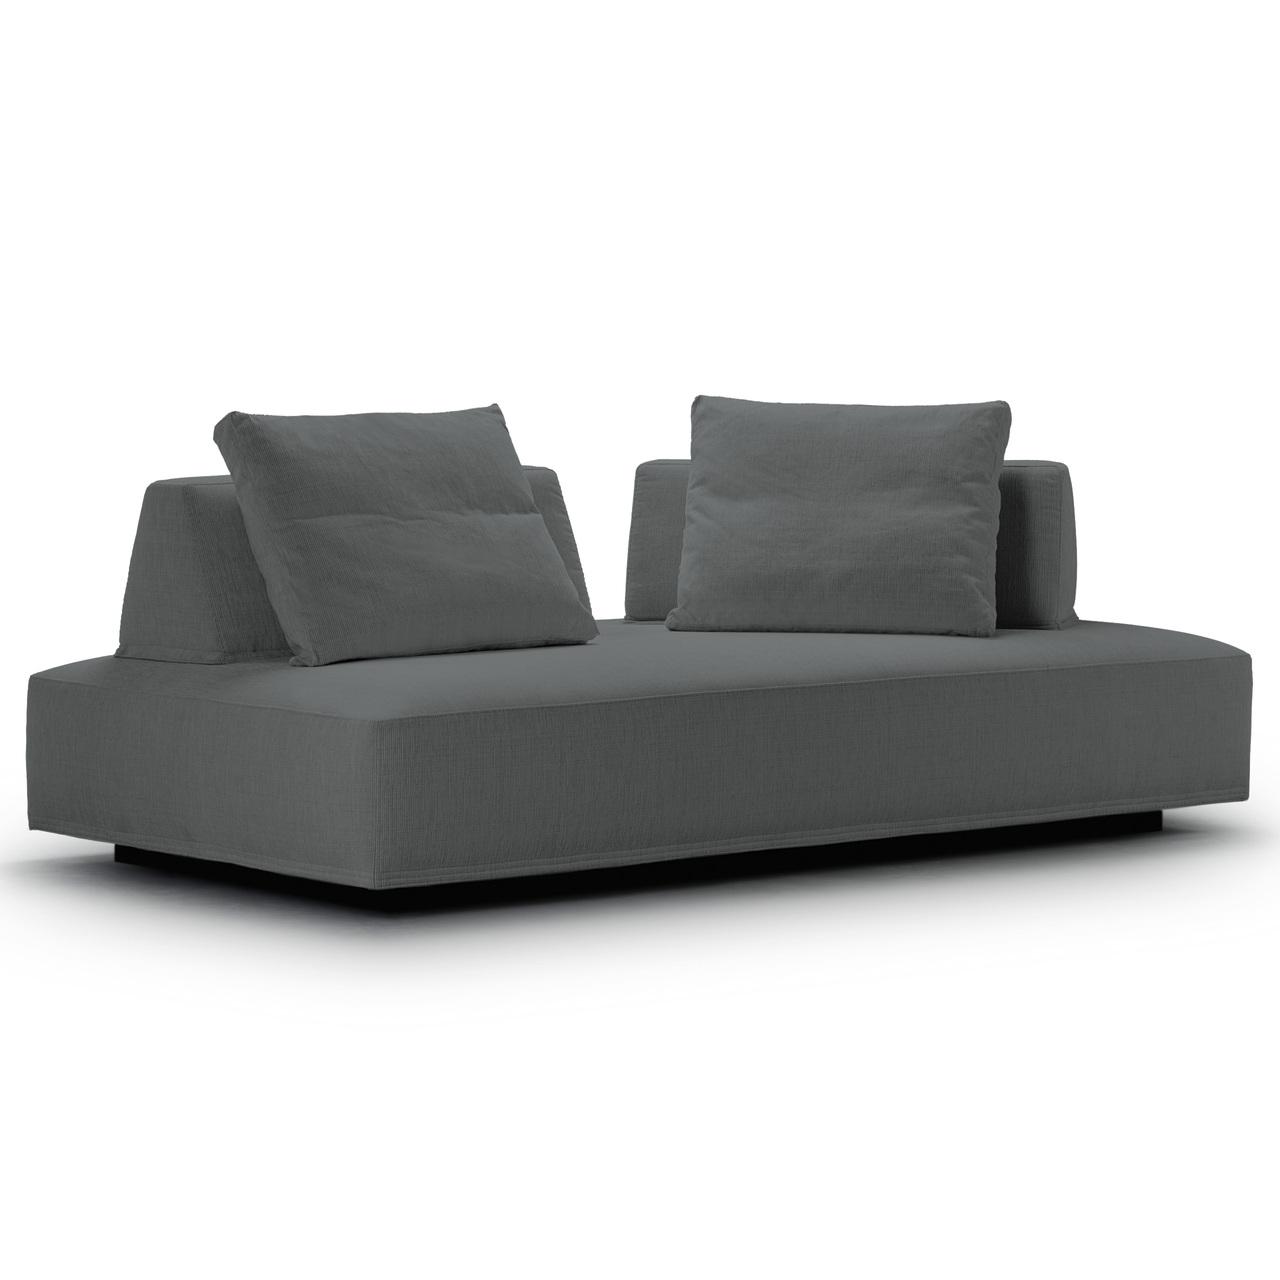 Eilersen Sofa 'Playground' Dunkelgrau 06 - Herring, B: 200 cm / T: 130 cm